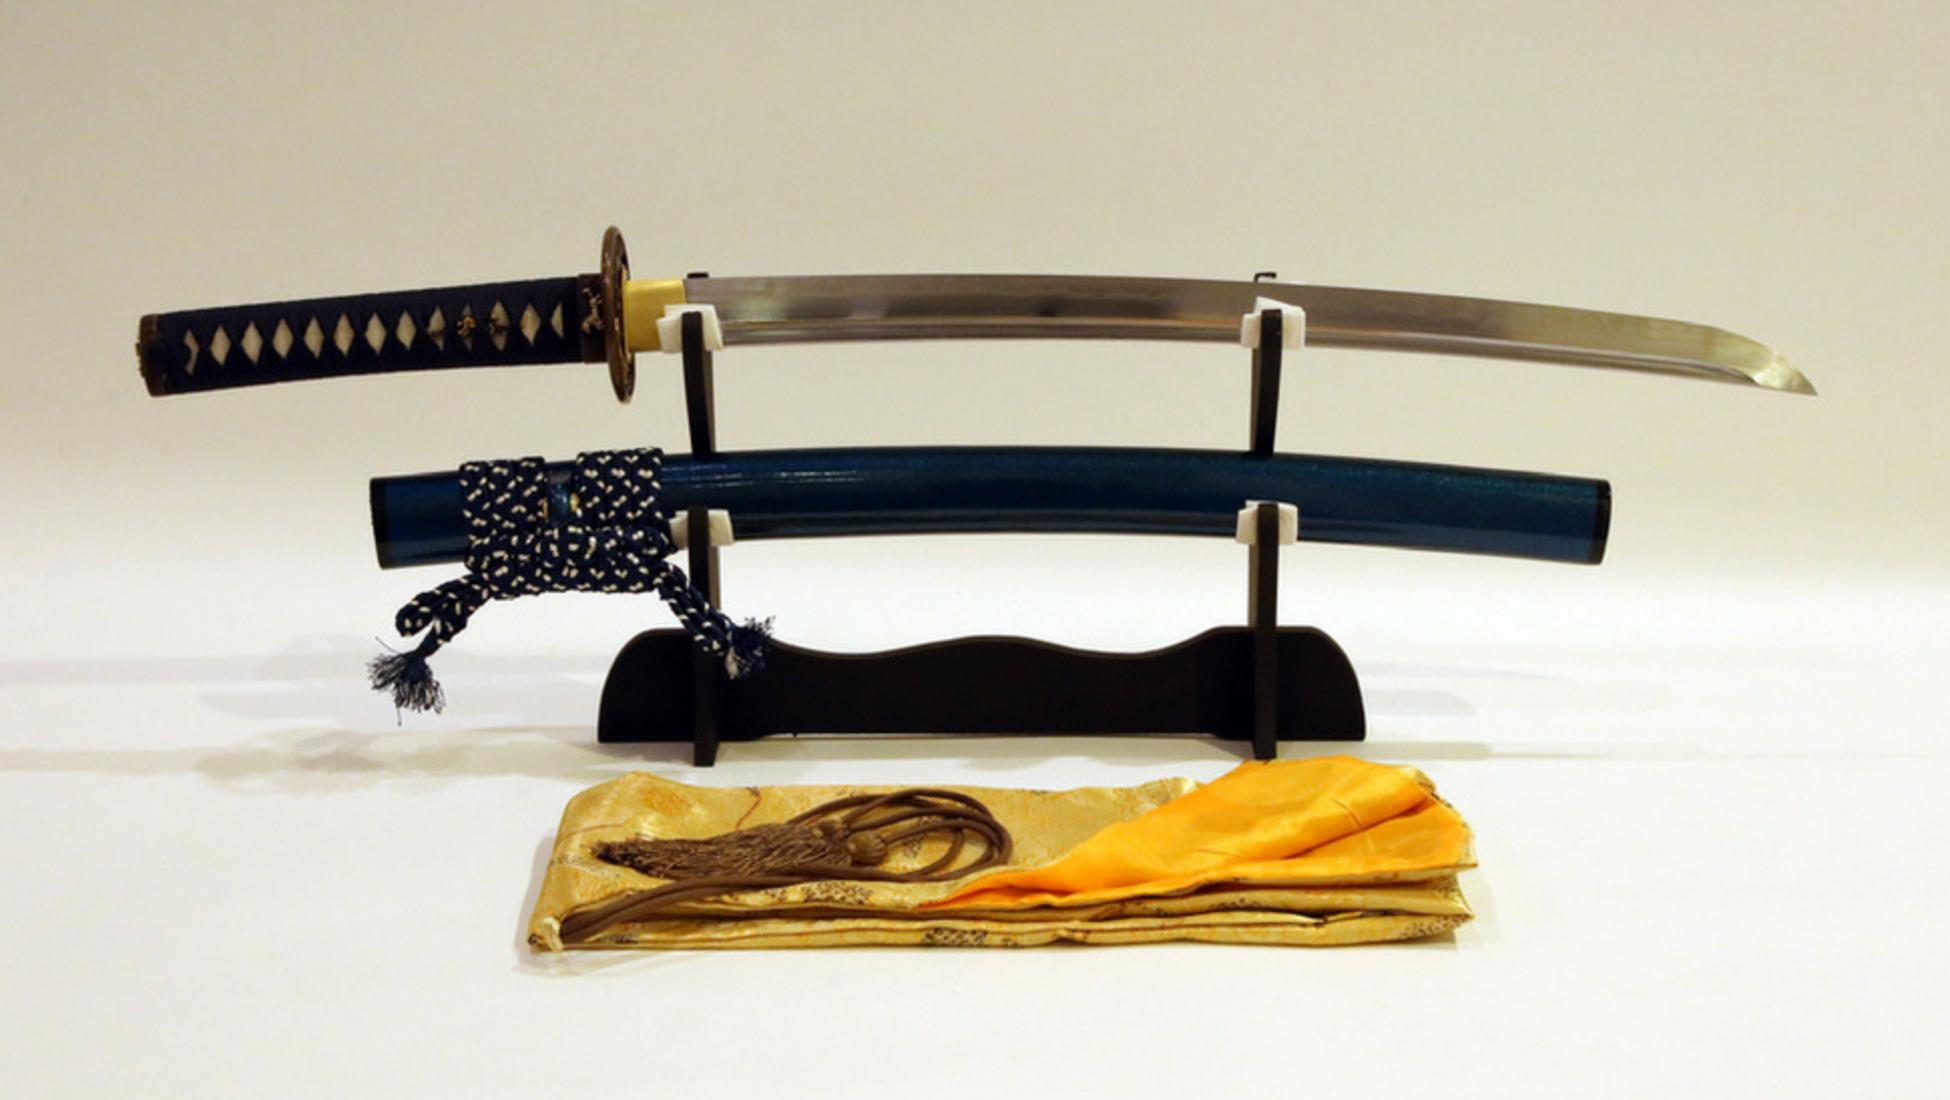 Guerreros japoneses  5 datos interesantes sobre los samuráis - Catawiki f1f6d6f048c